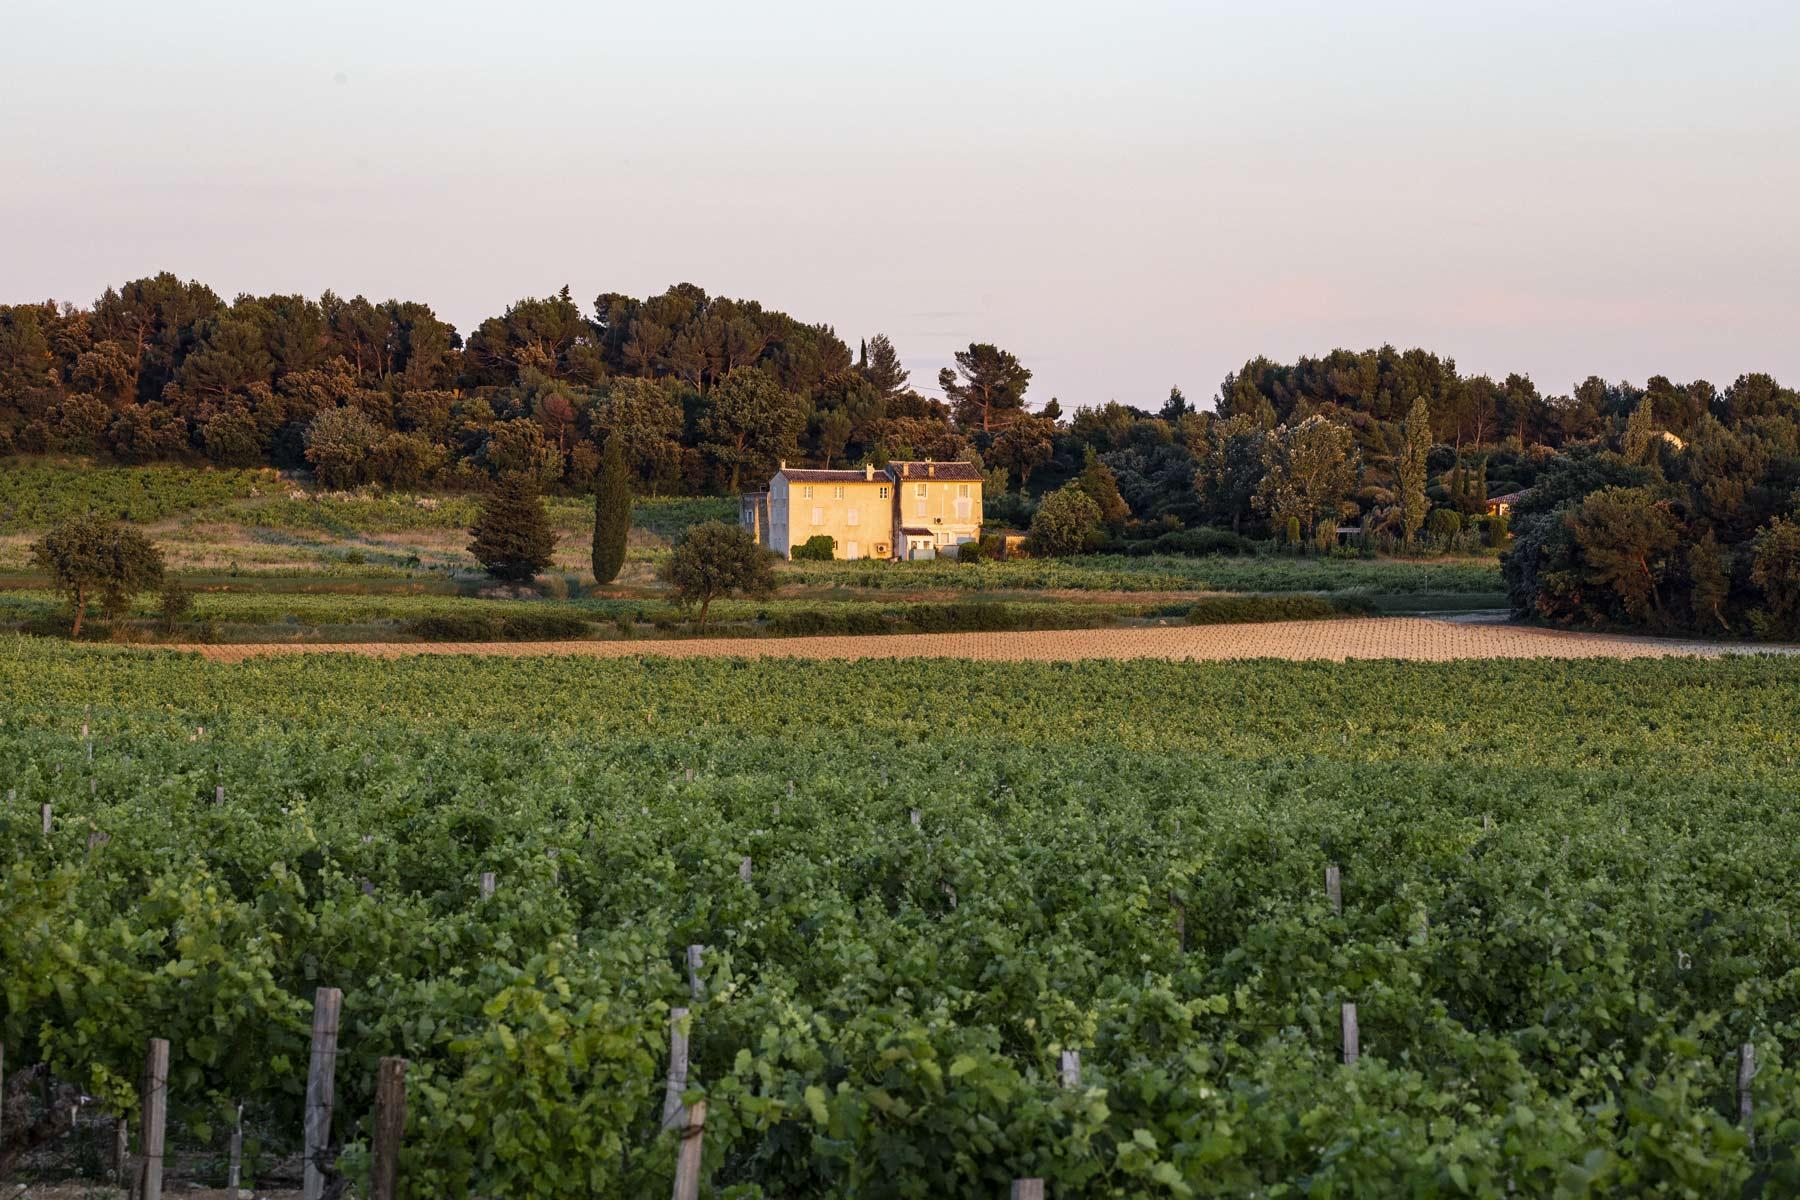 Weingut in der Nähe von Beaume de Venise